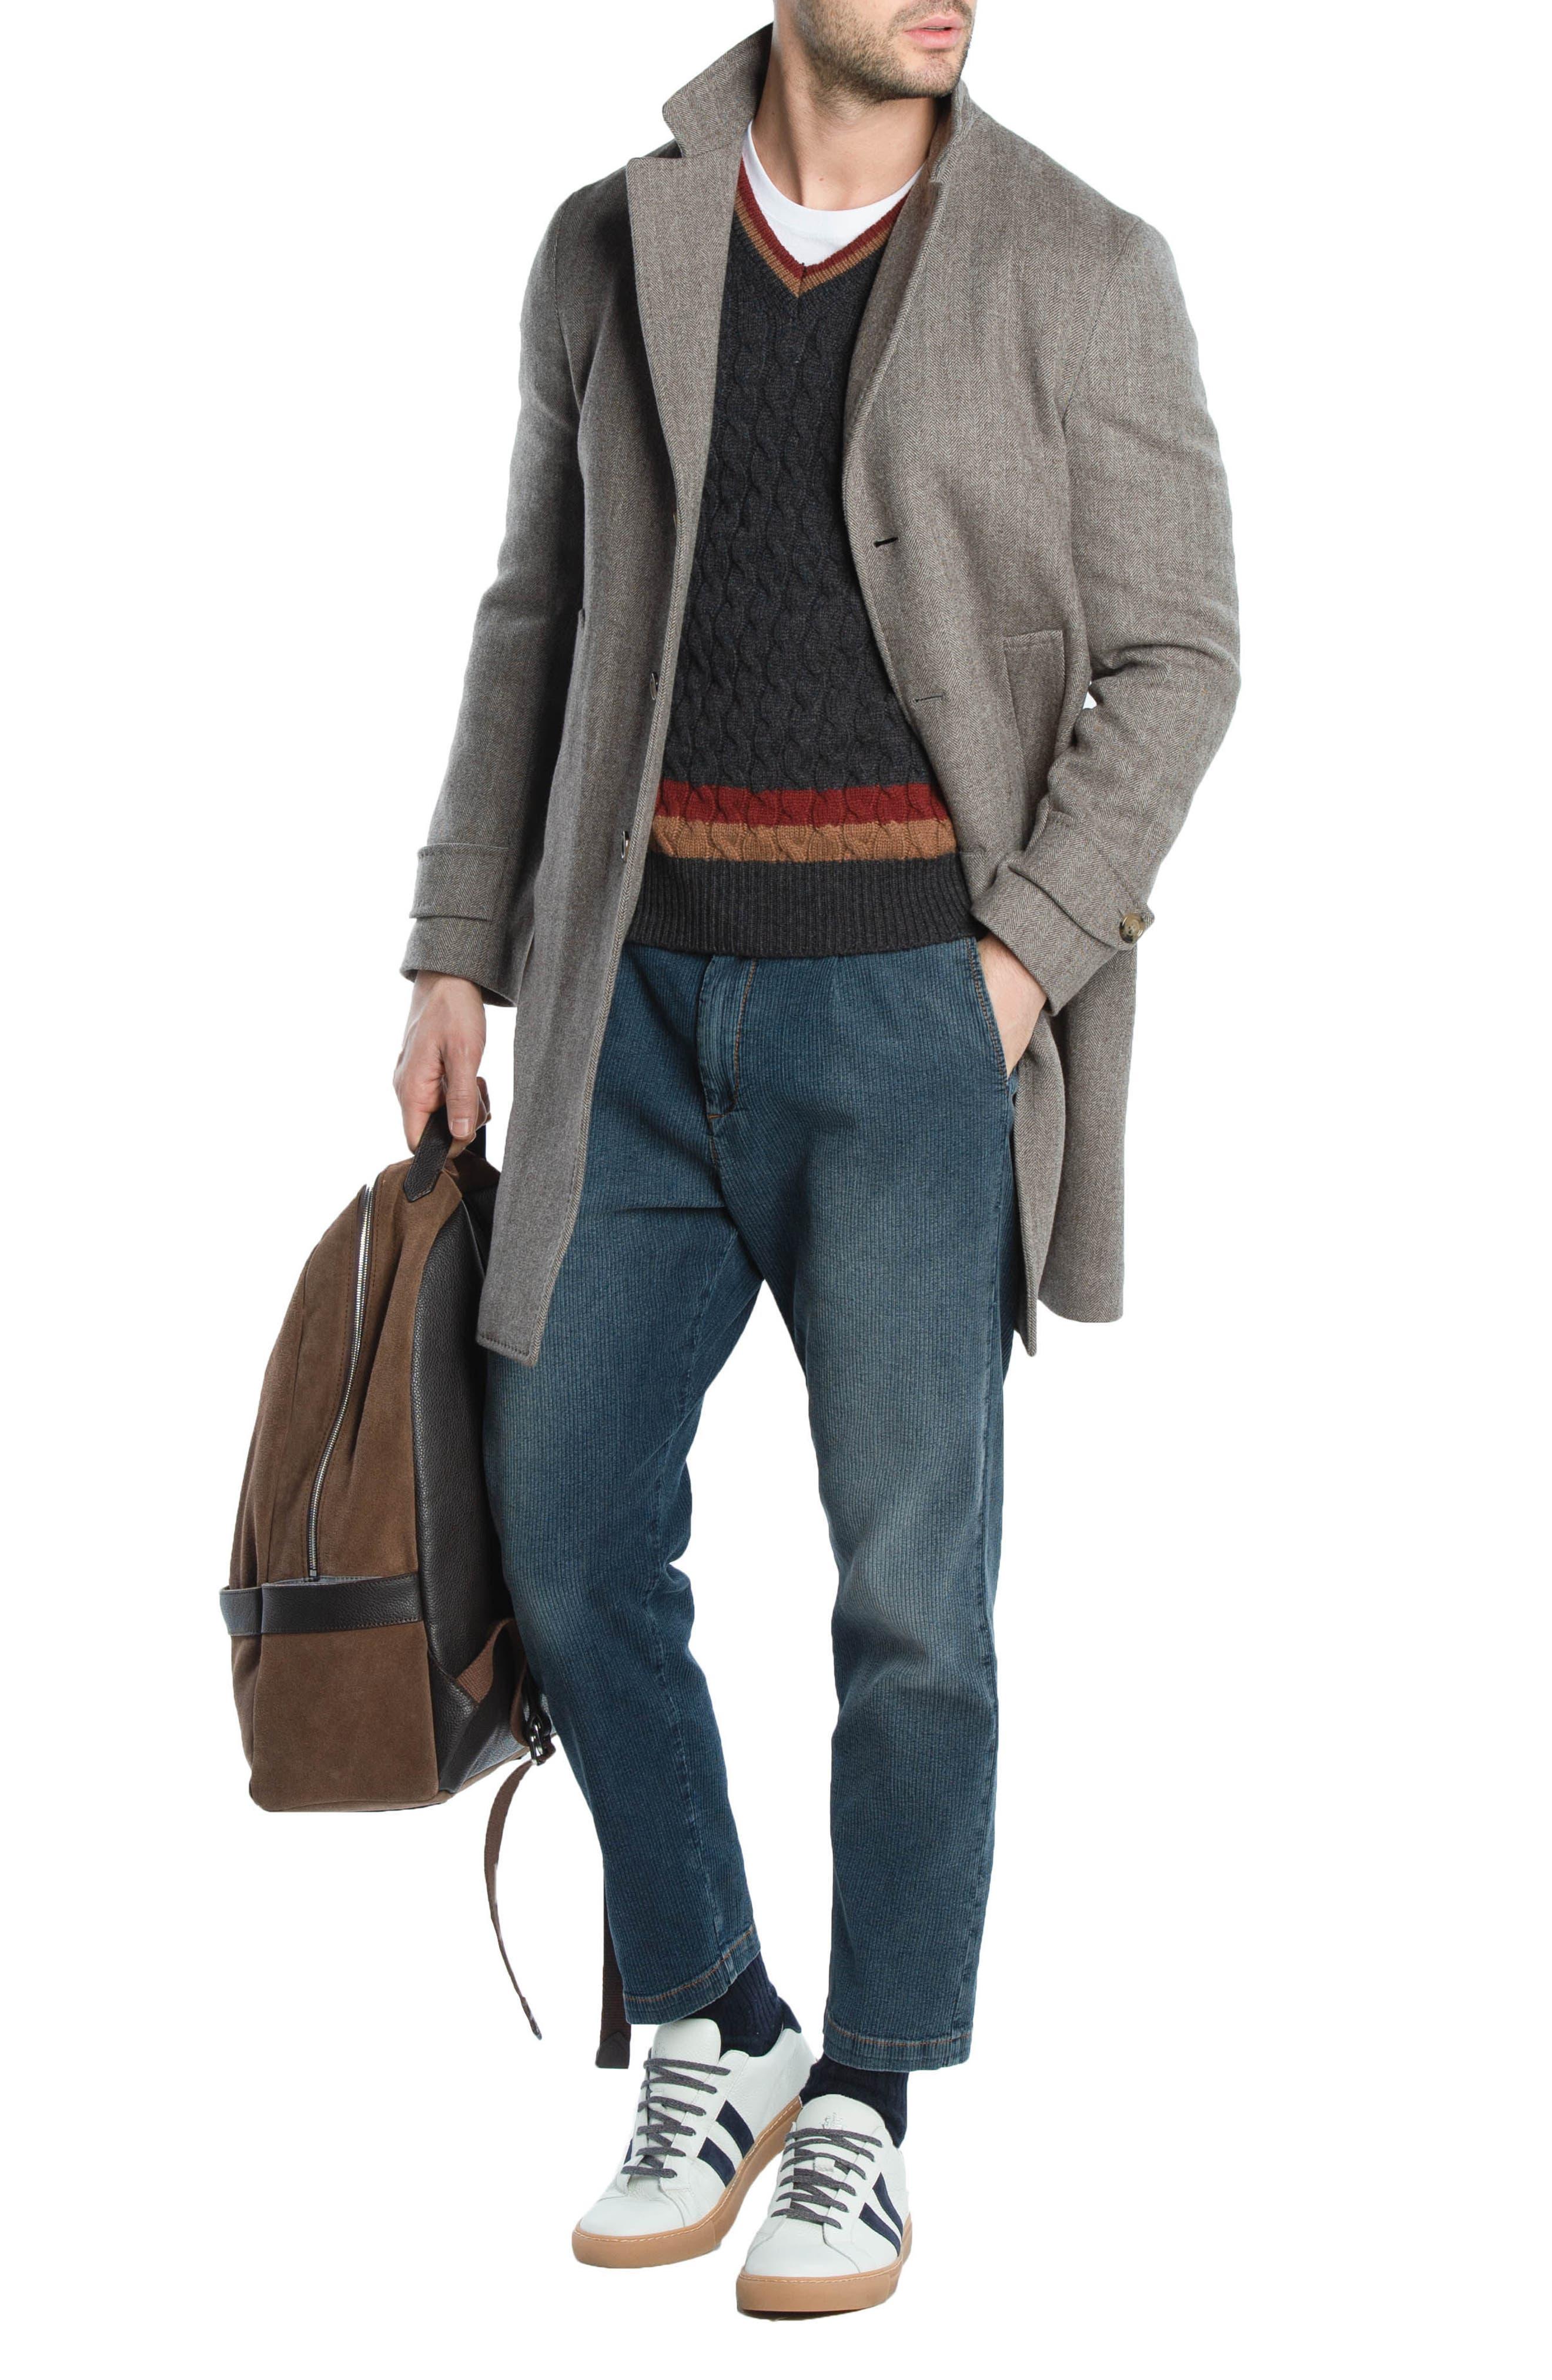 Cableknit Cashmere V-Neck Sweater,                             Alternate thumbnail 3, color,                             DARK GREY